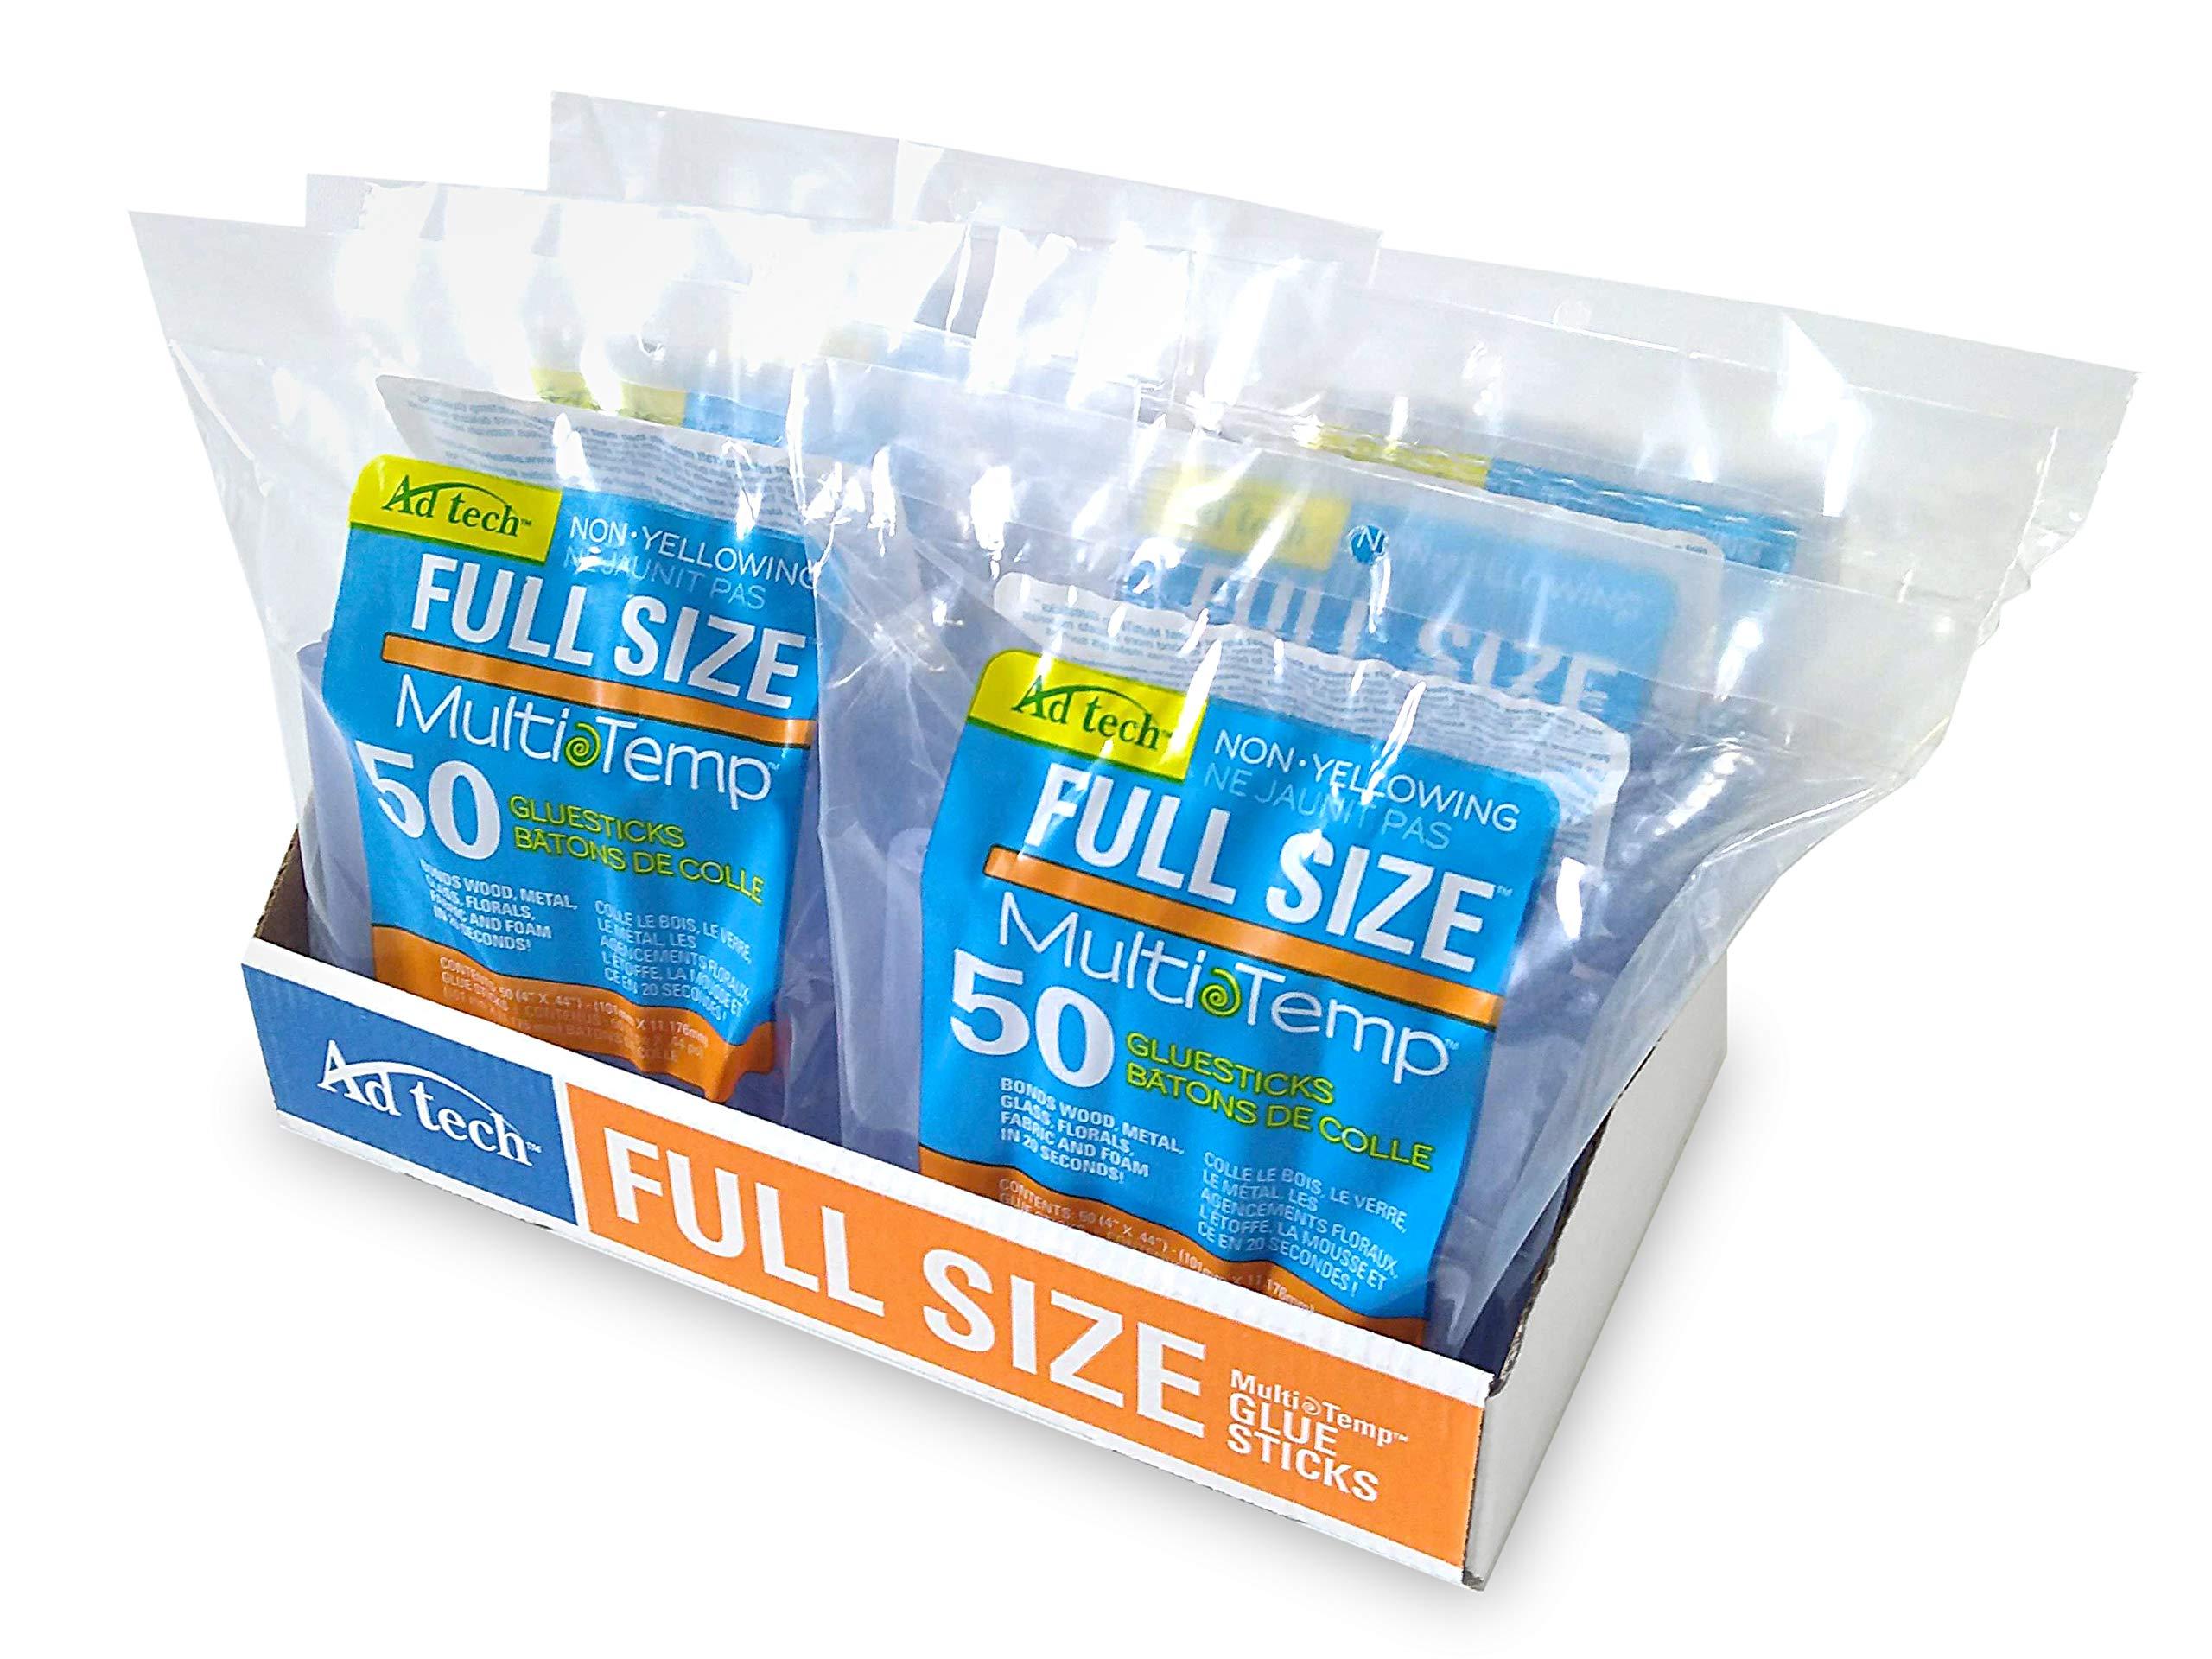 AdTech 14ZIP50-CASE Full Size Multi Temp Clear Bulk Glue Sticks, 4 inch length, 300 Pieces